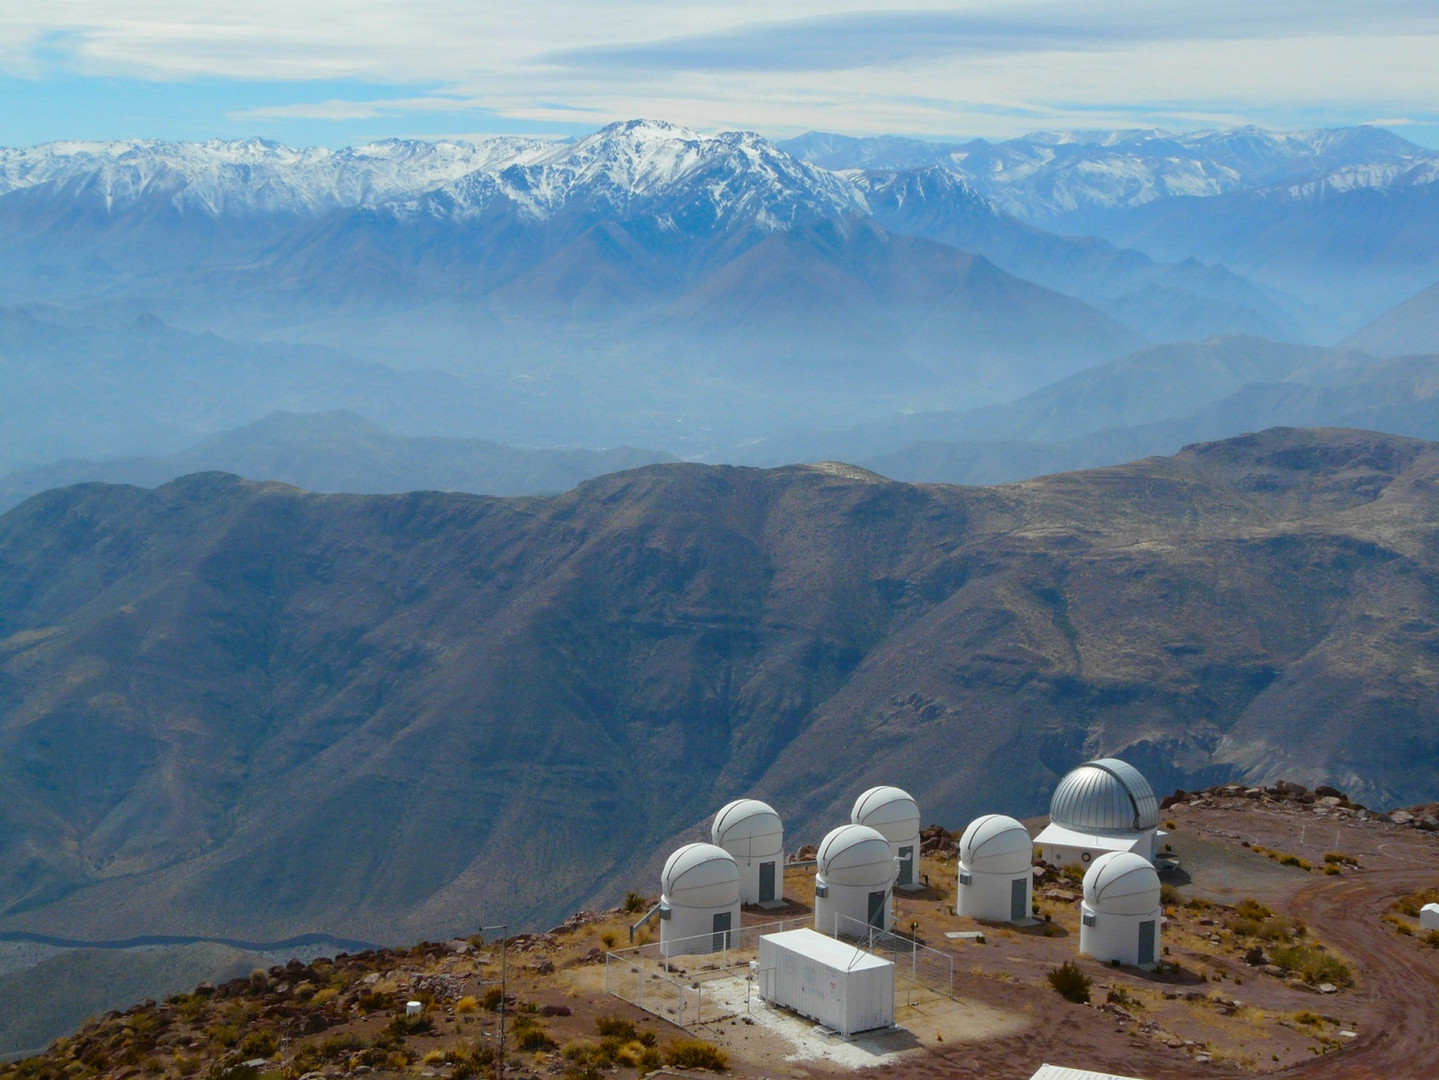 Séjour d'astronomie au Chili Cap Astro Evasion - 5